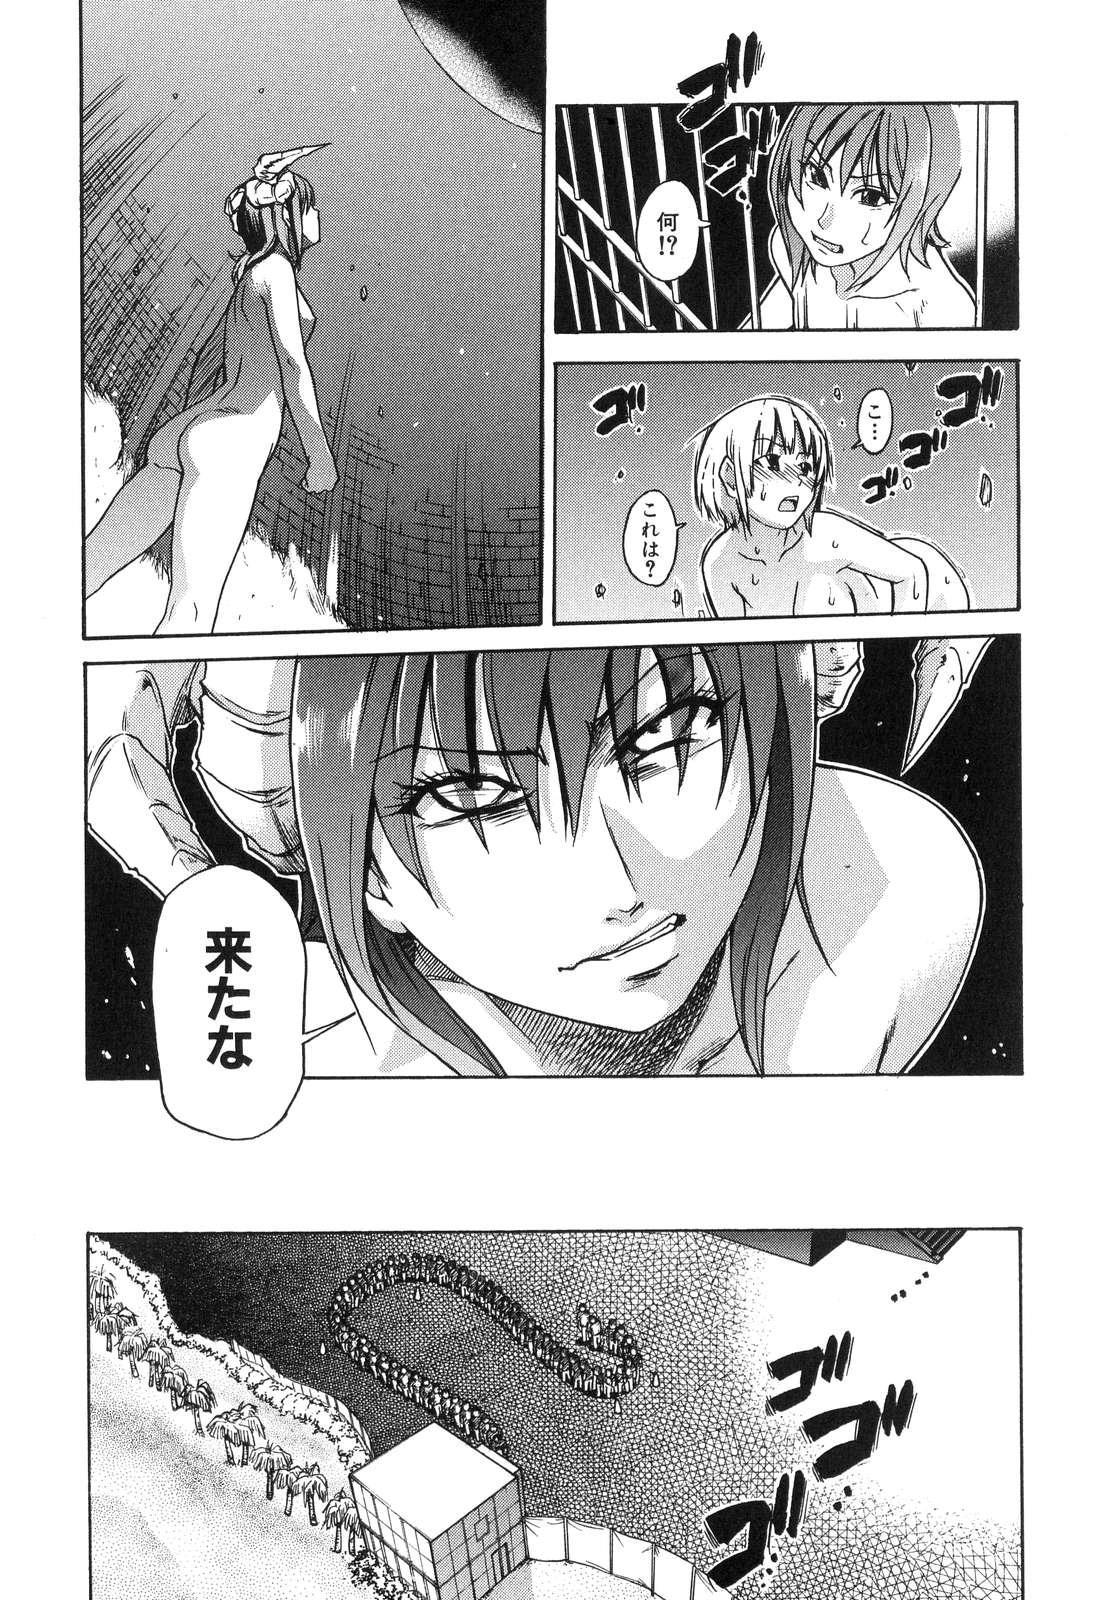 Shining Musume. 6. Rainbow Six 50